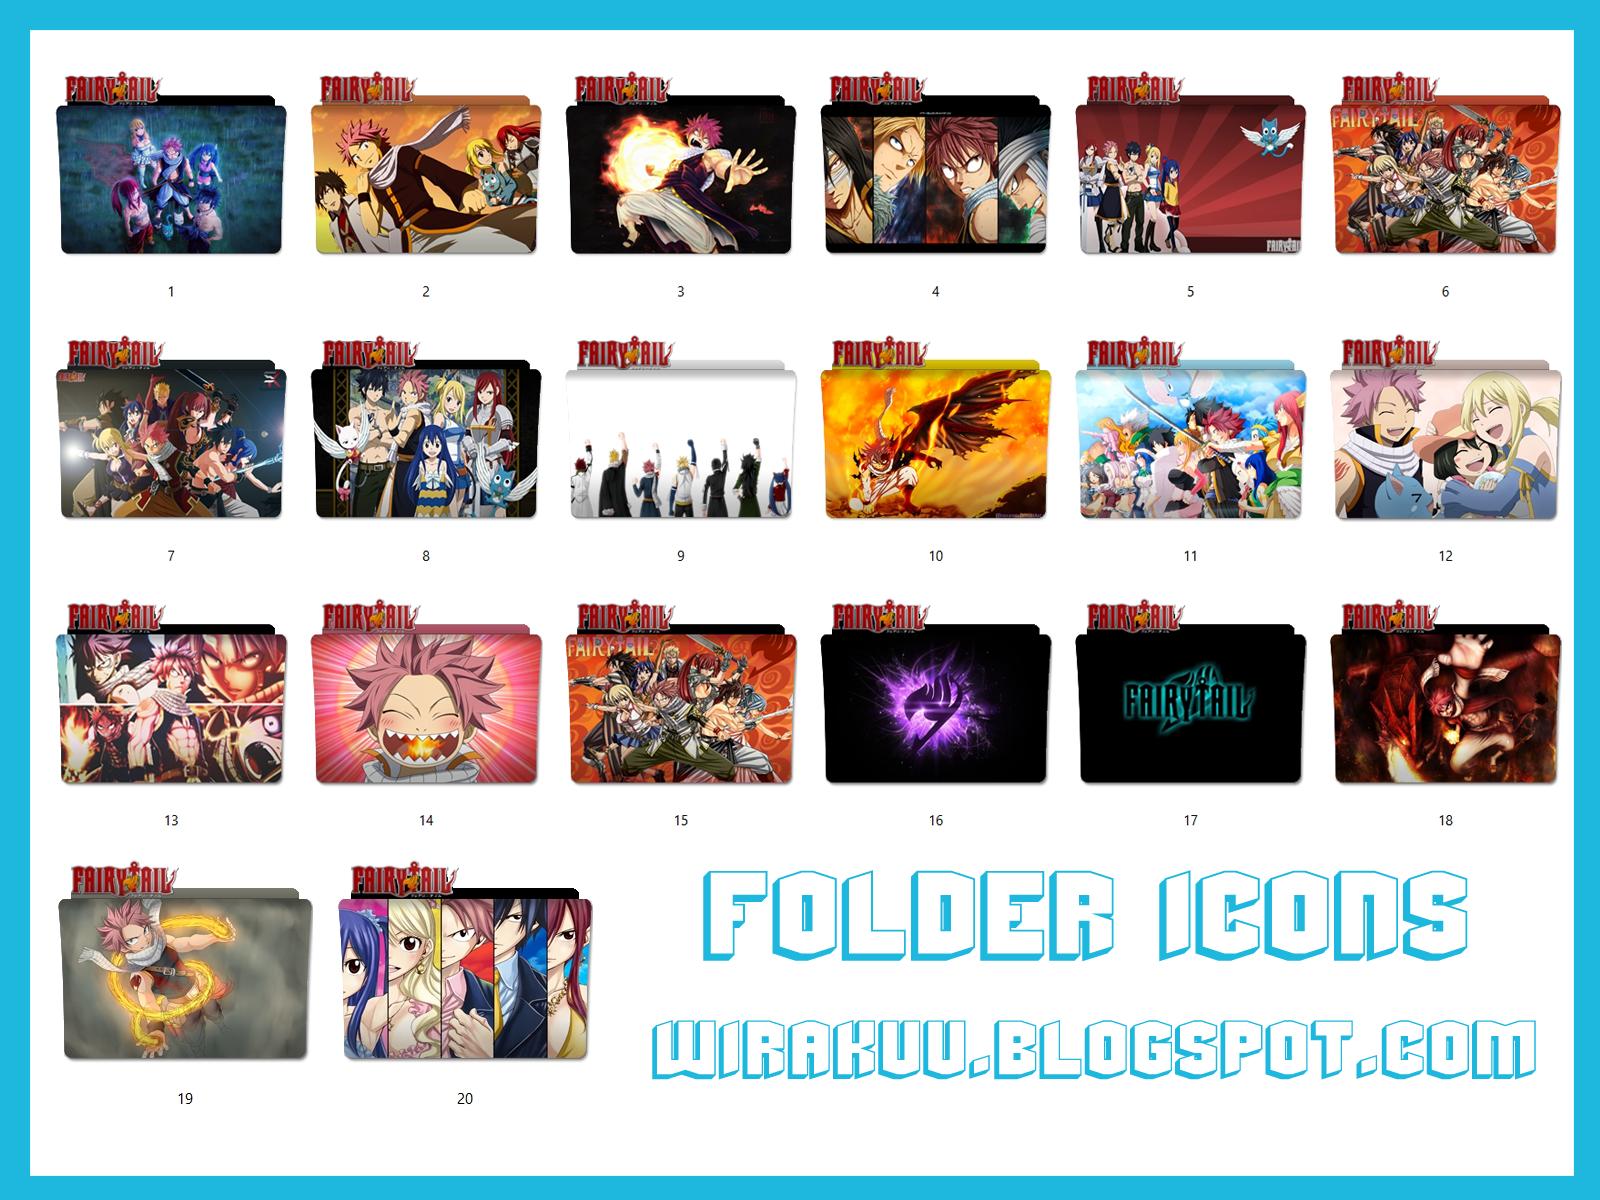 20 Folder Icons Anime Fairy Tail Pack 2 (Windows 7, 8, 10)